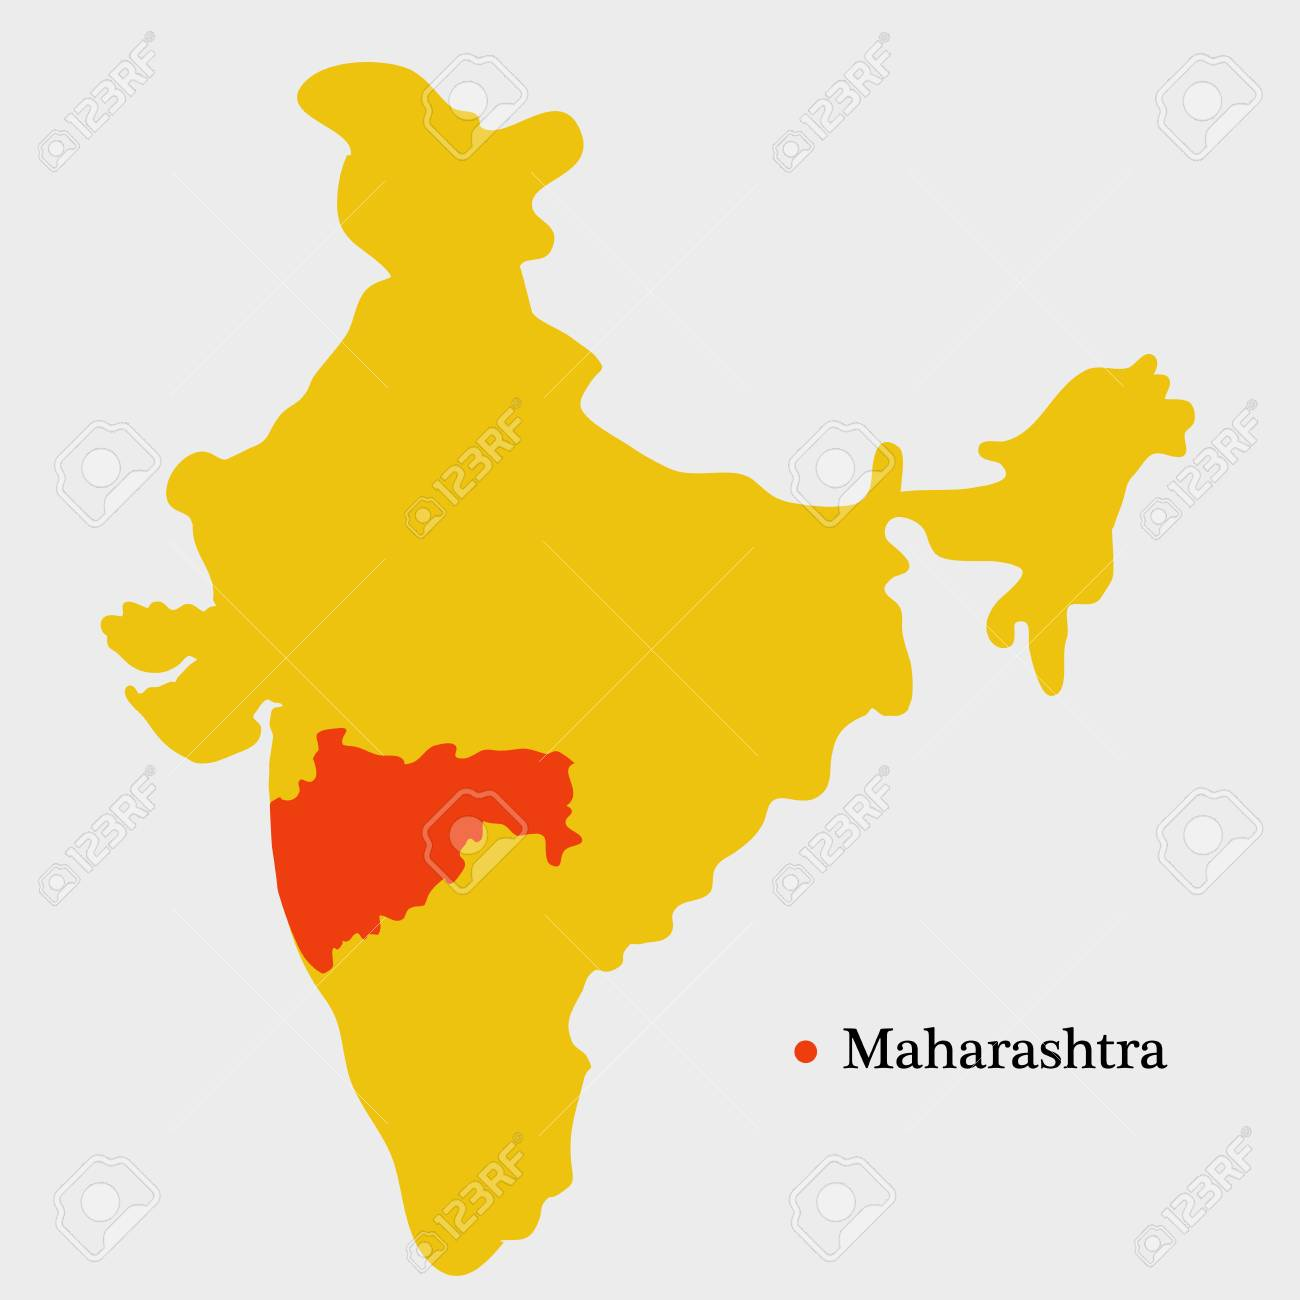 Illustration Of India Map Showing Indian State Maharashtra With